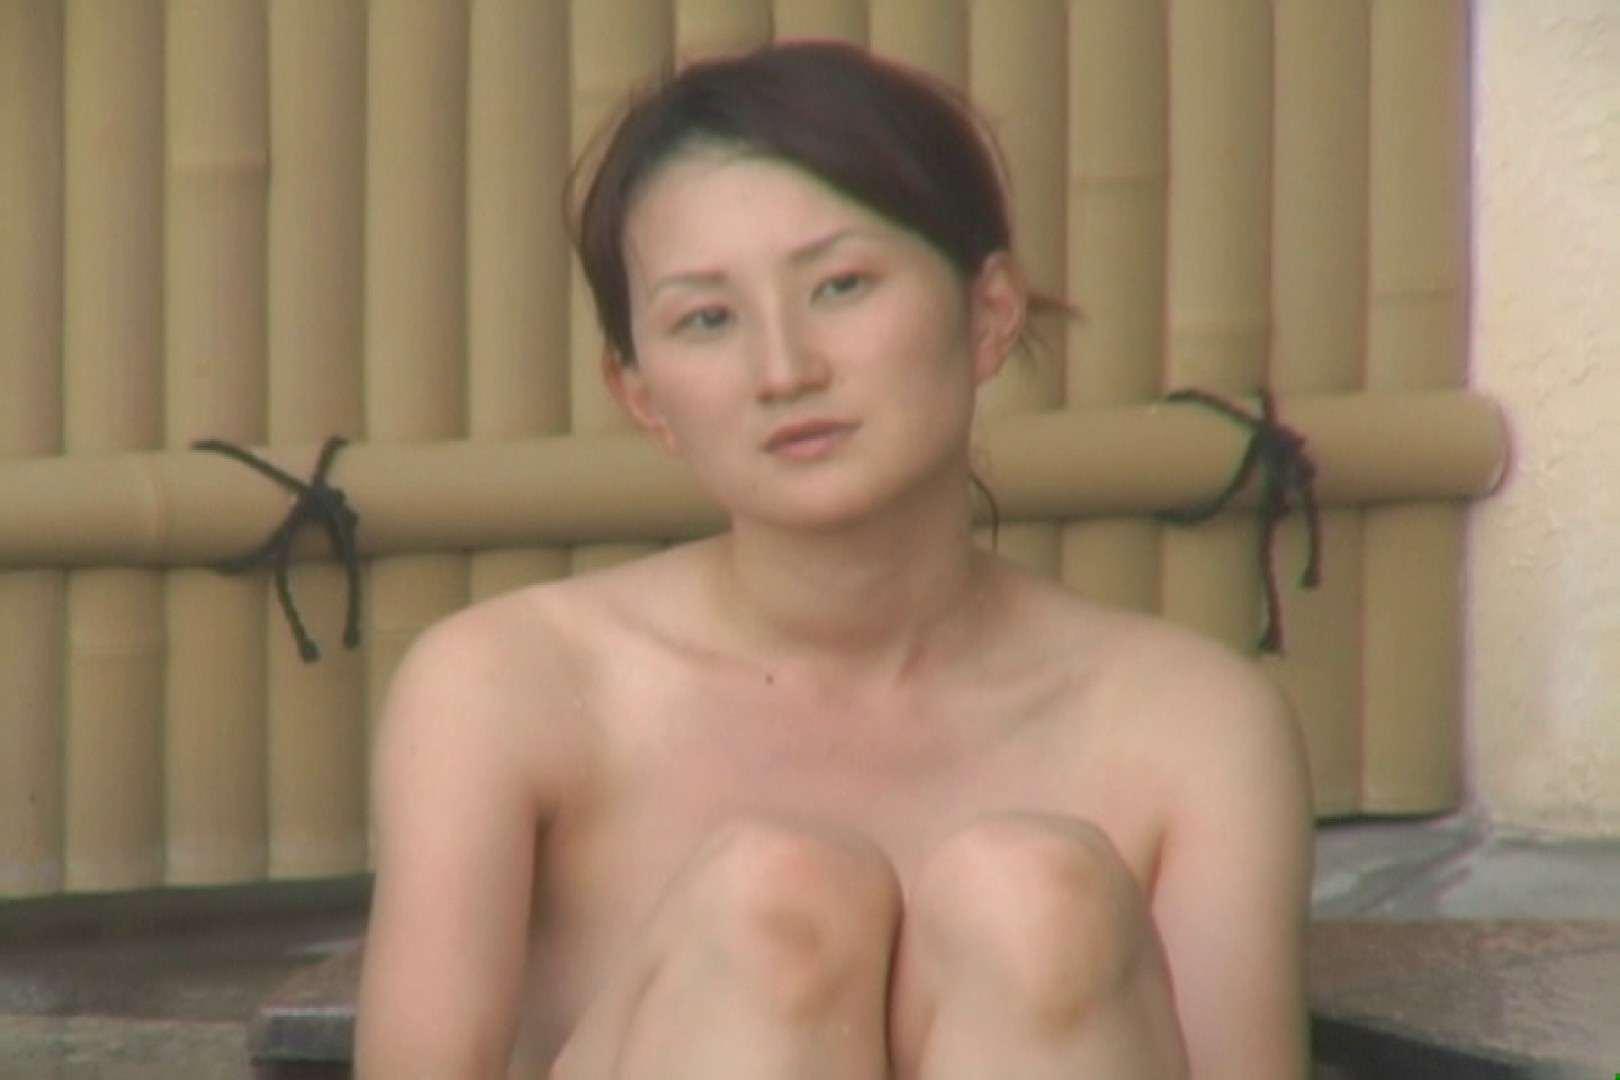 Aquaな露天風呂Vol.578 露天風呂突入 のぞき動画画像 70pic 20